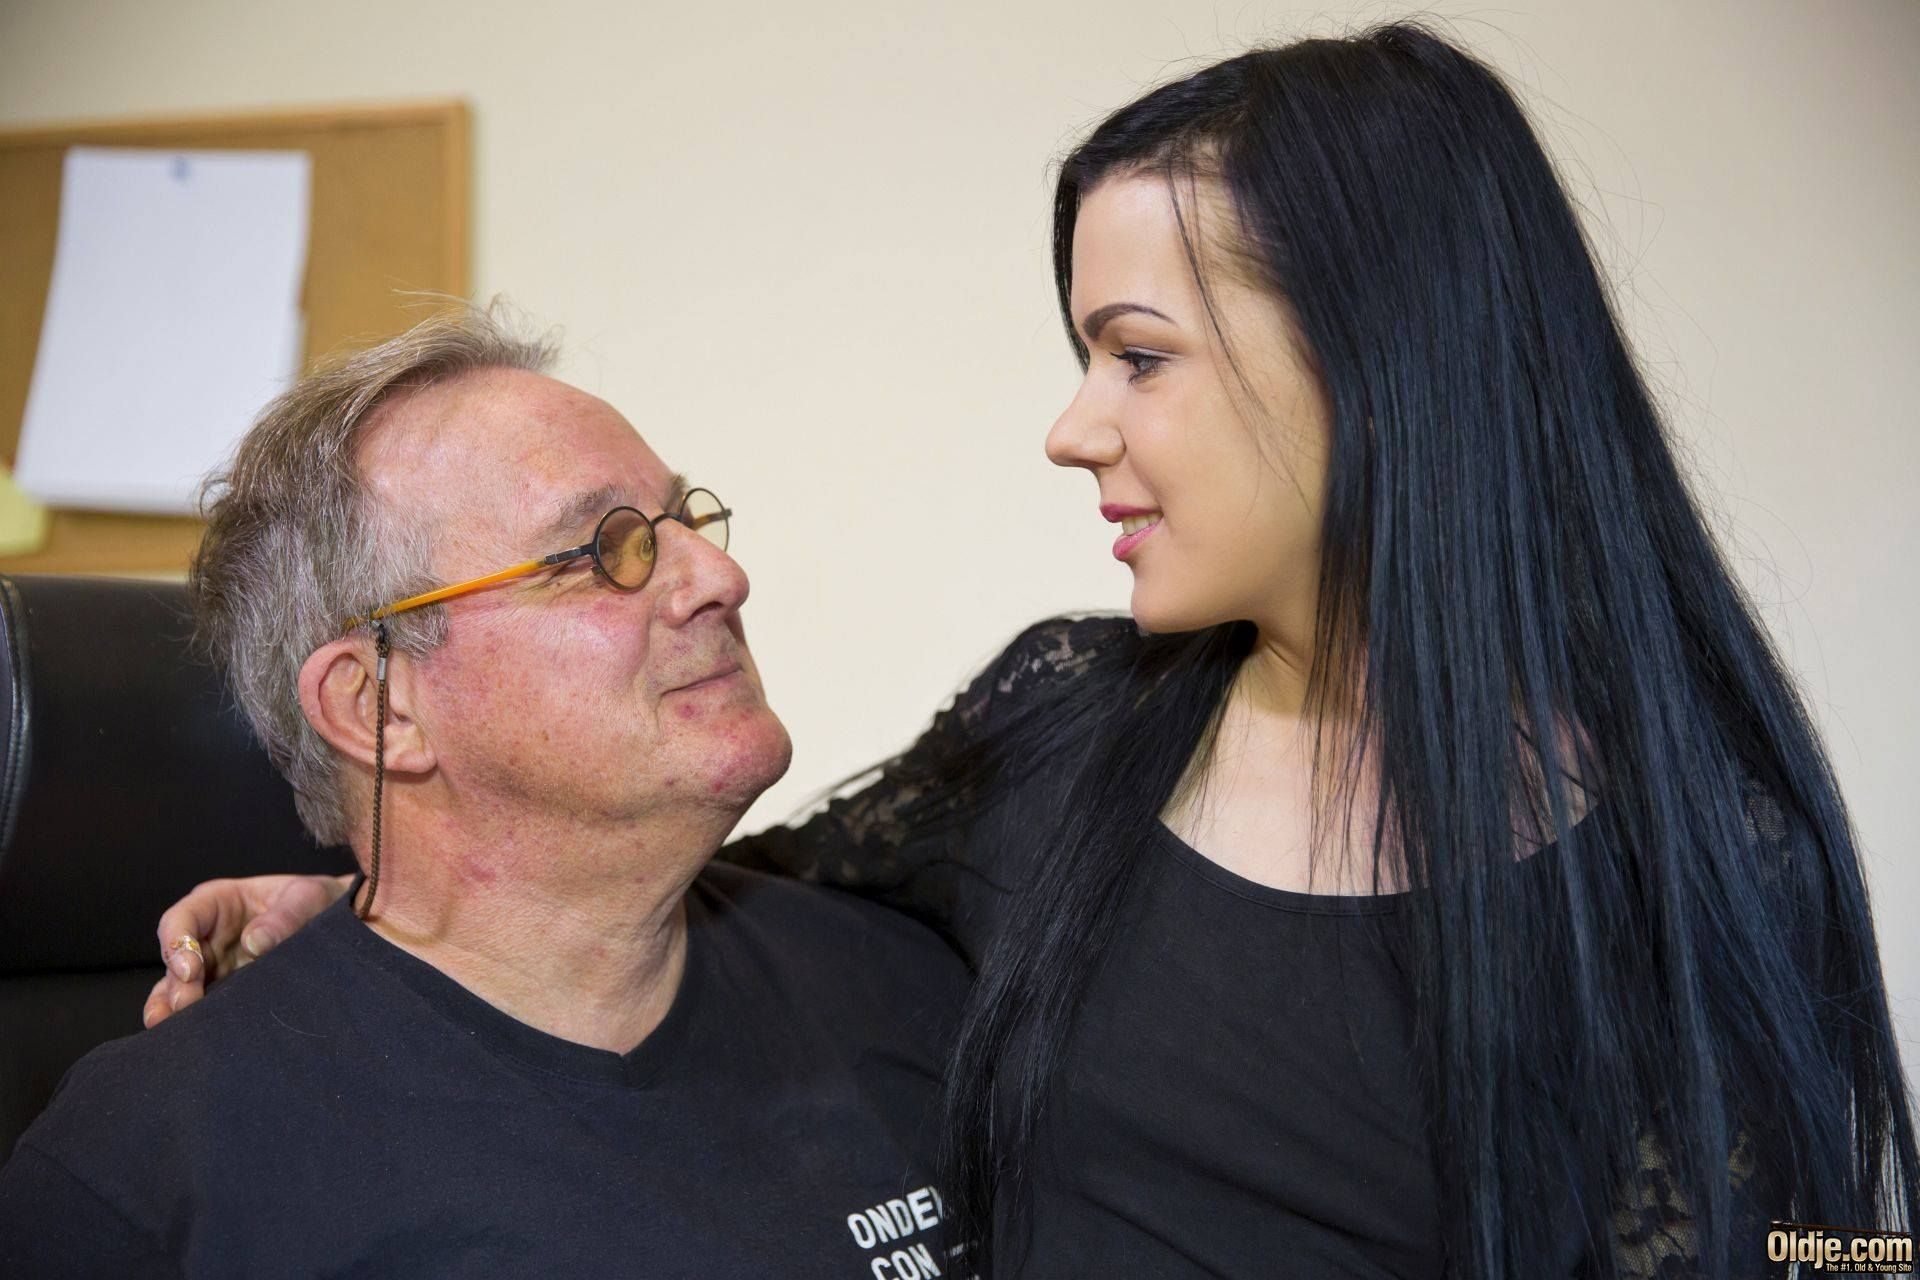 Young men seducing older women